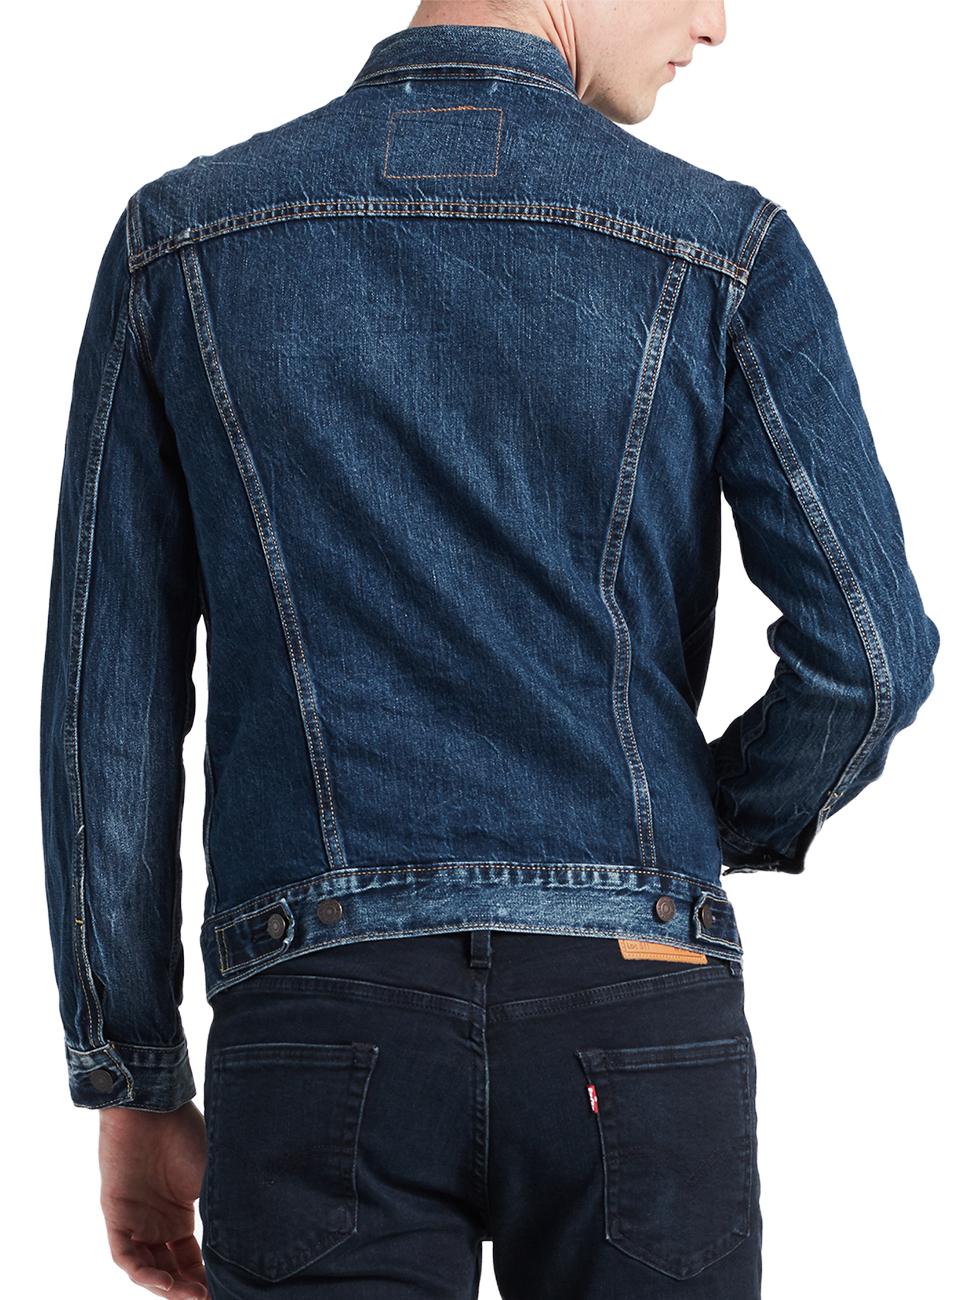 Levis® Herren Jeansjacke The Trucker Jacket Regular Fit